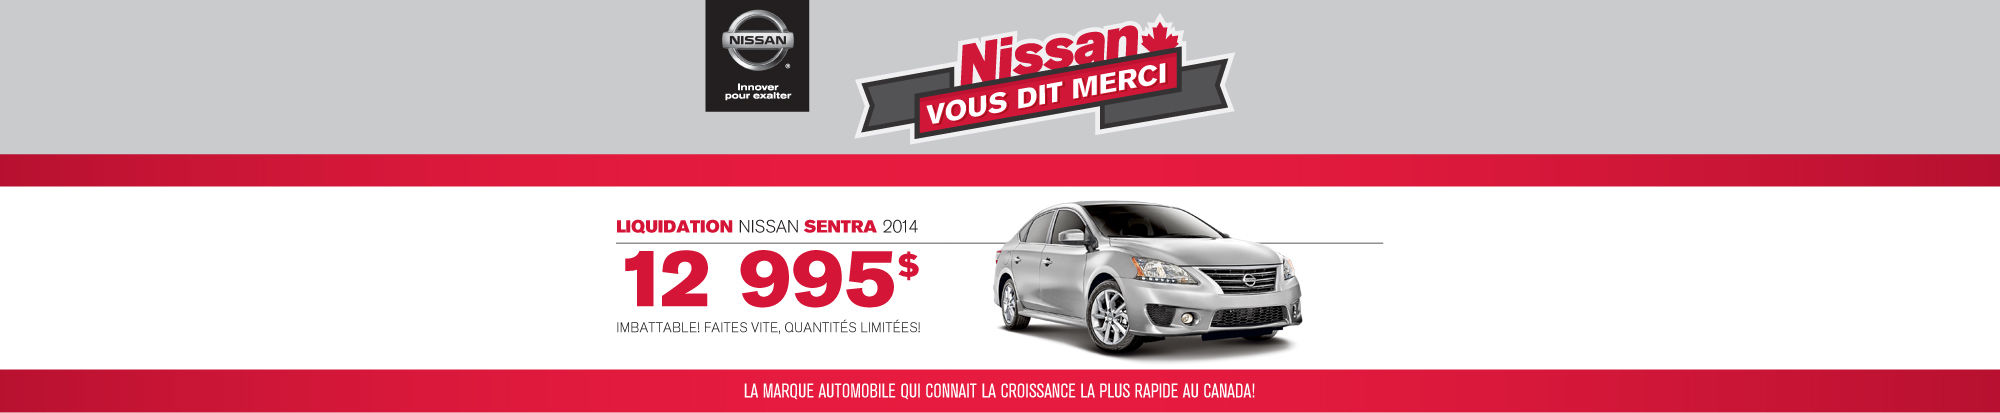 Nissan Snetra 2014